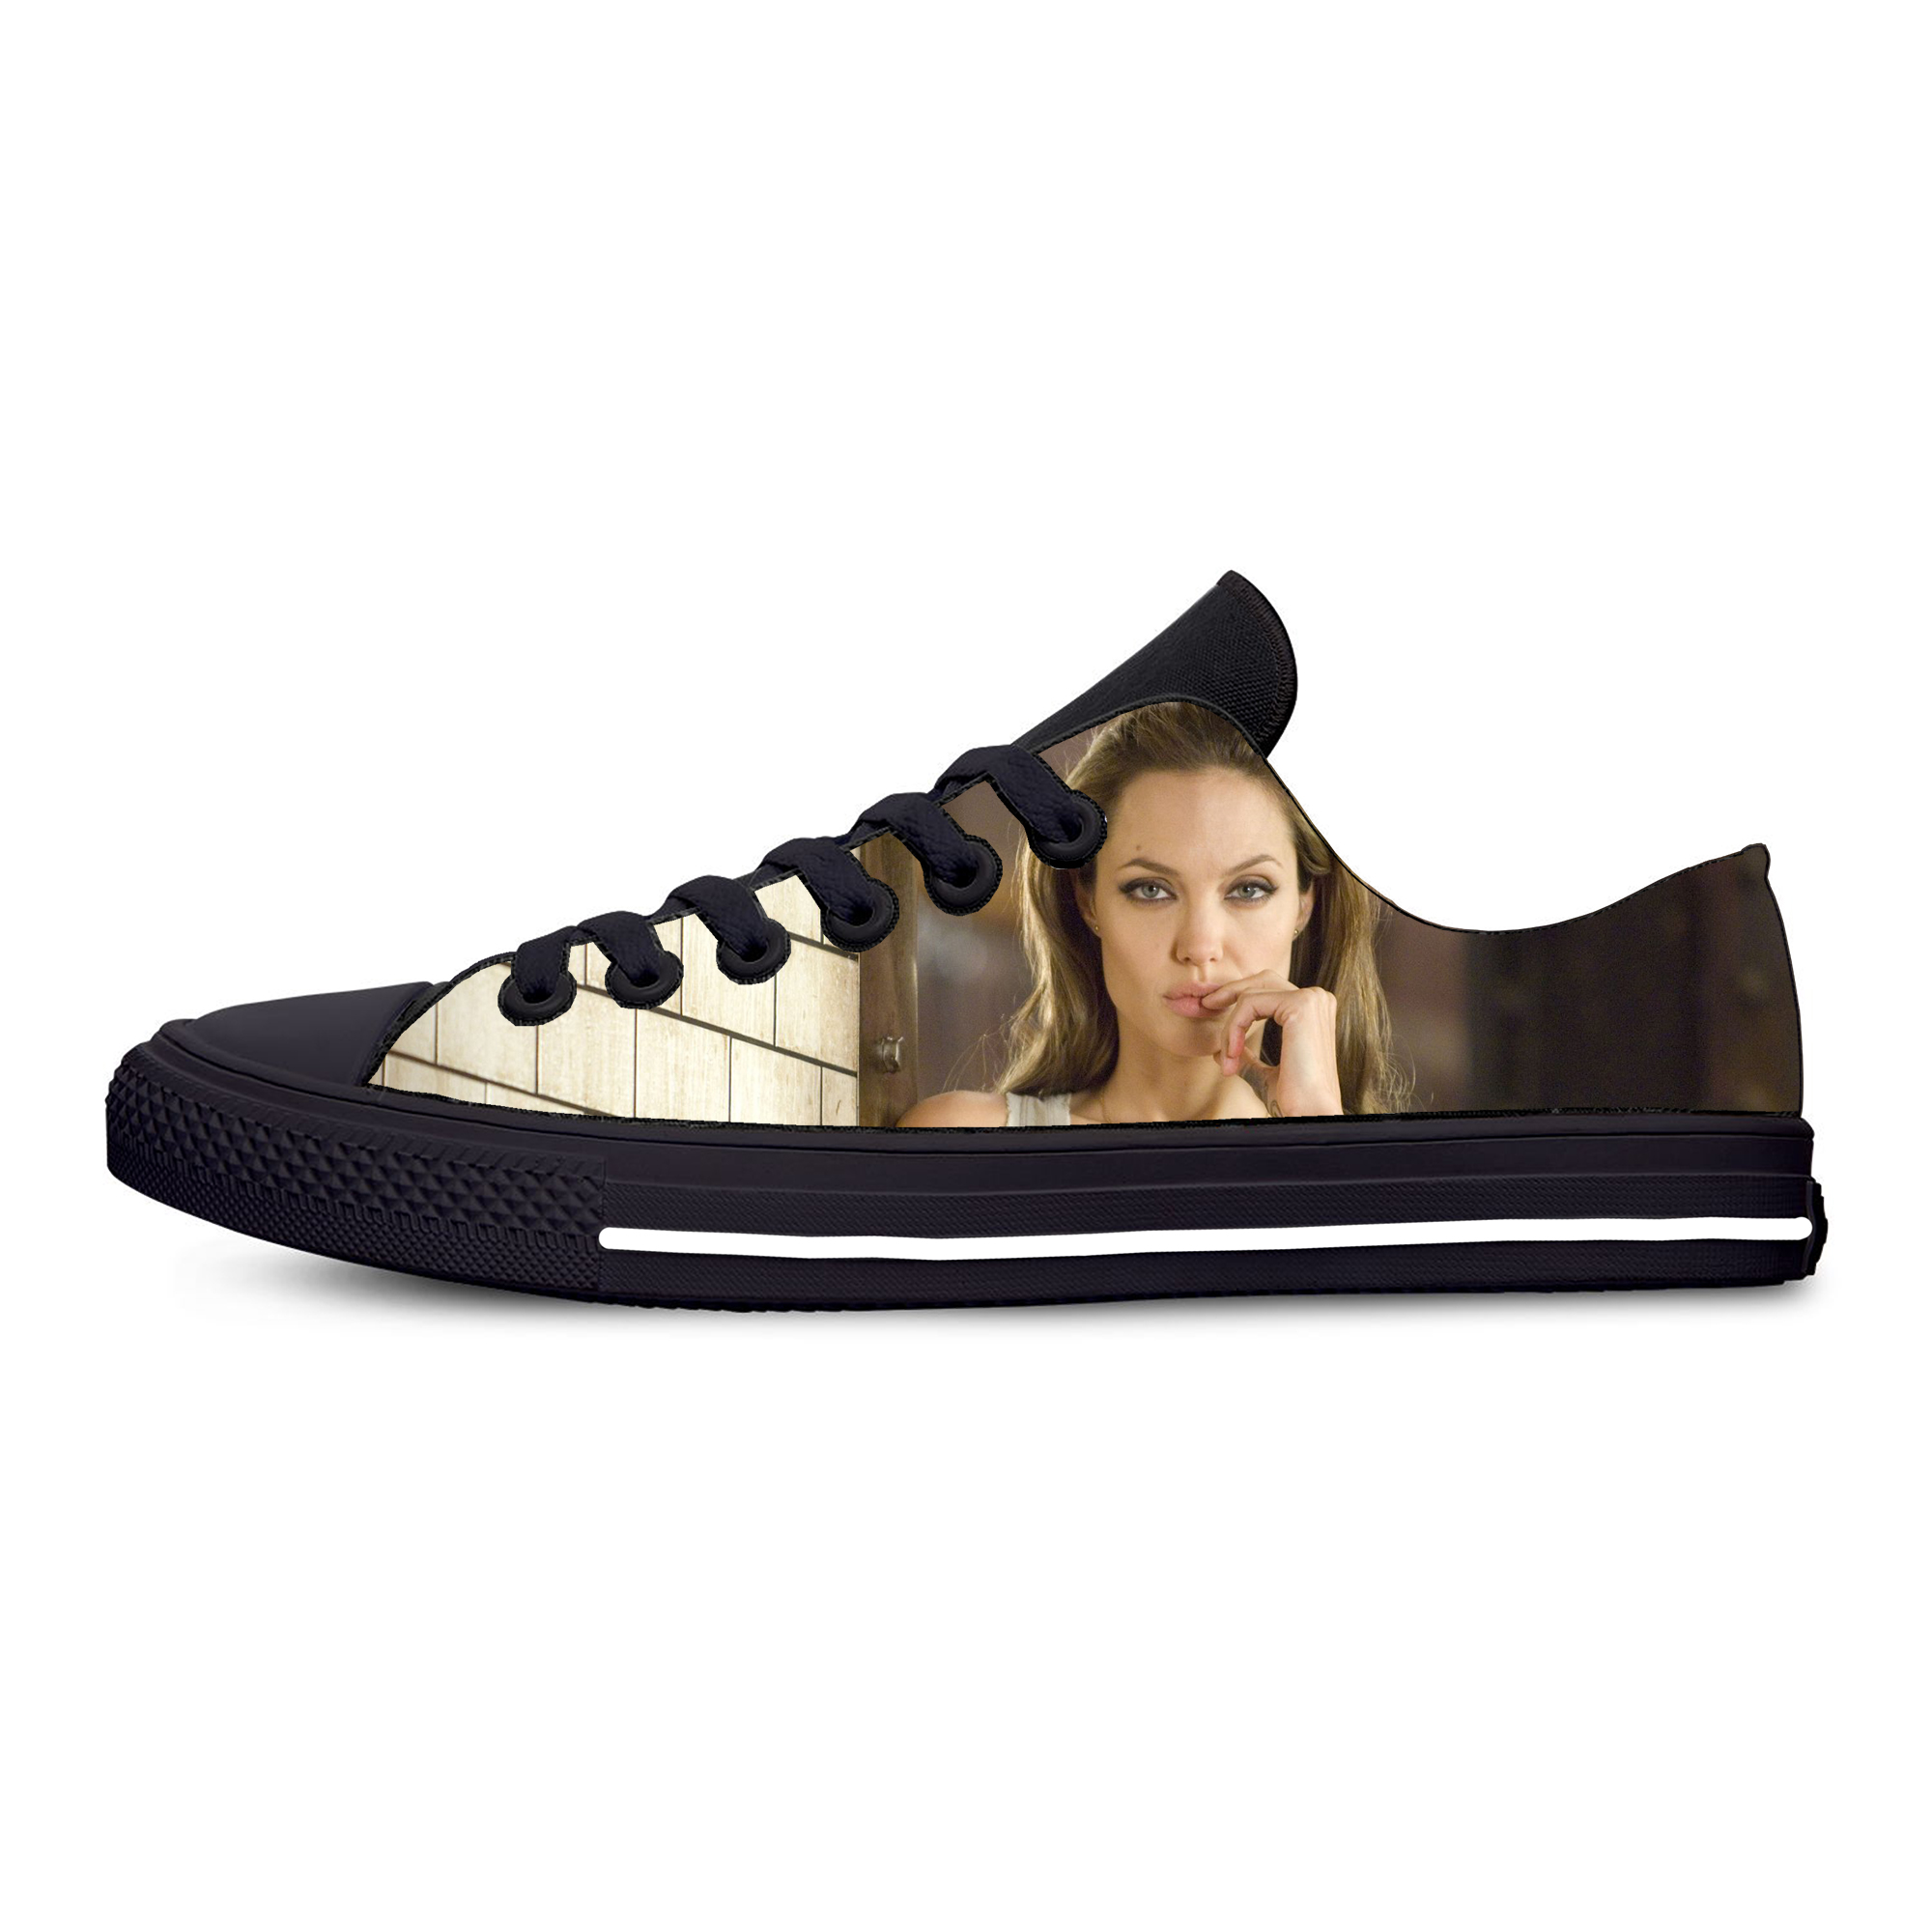 Fashion Casual Canvas Shoes Lace